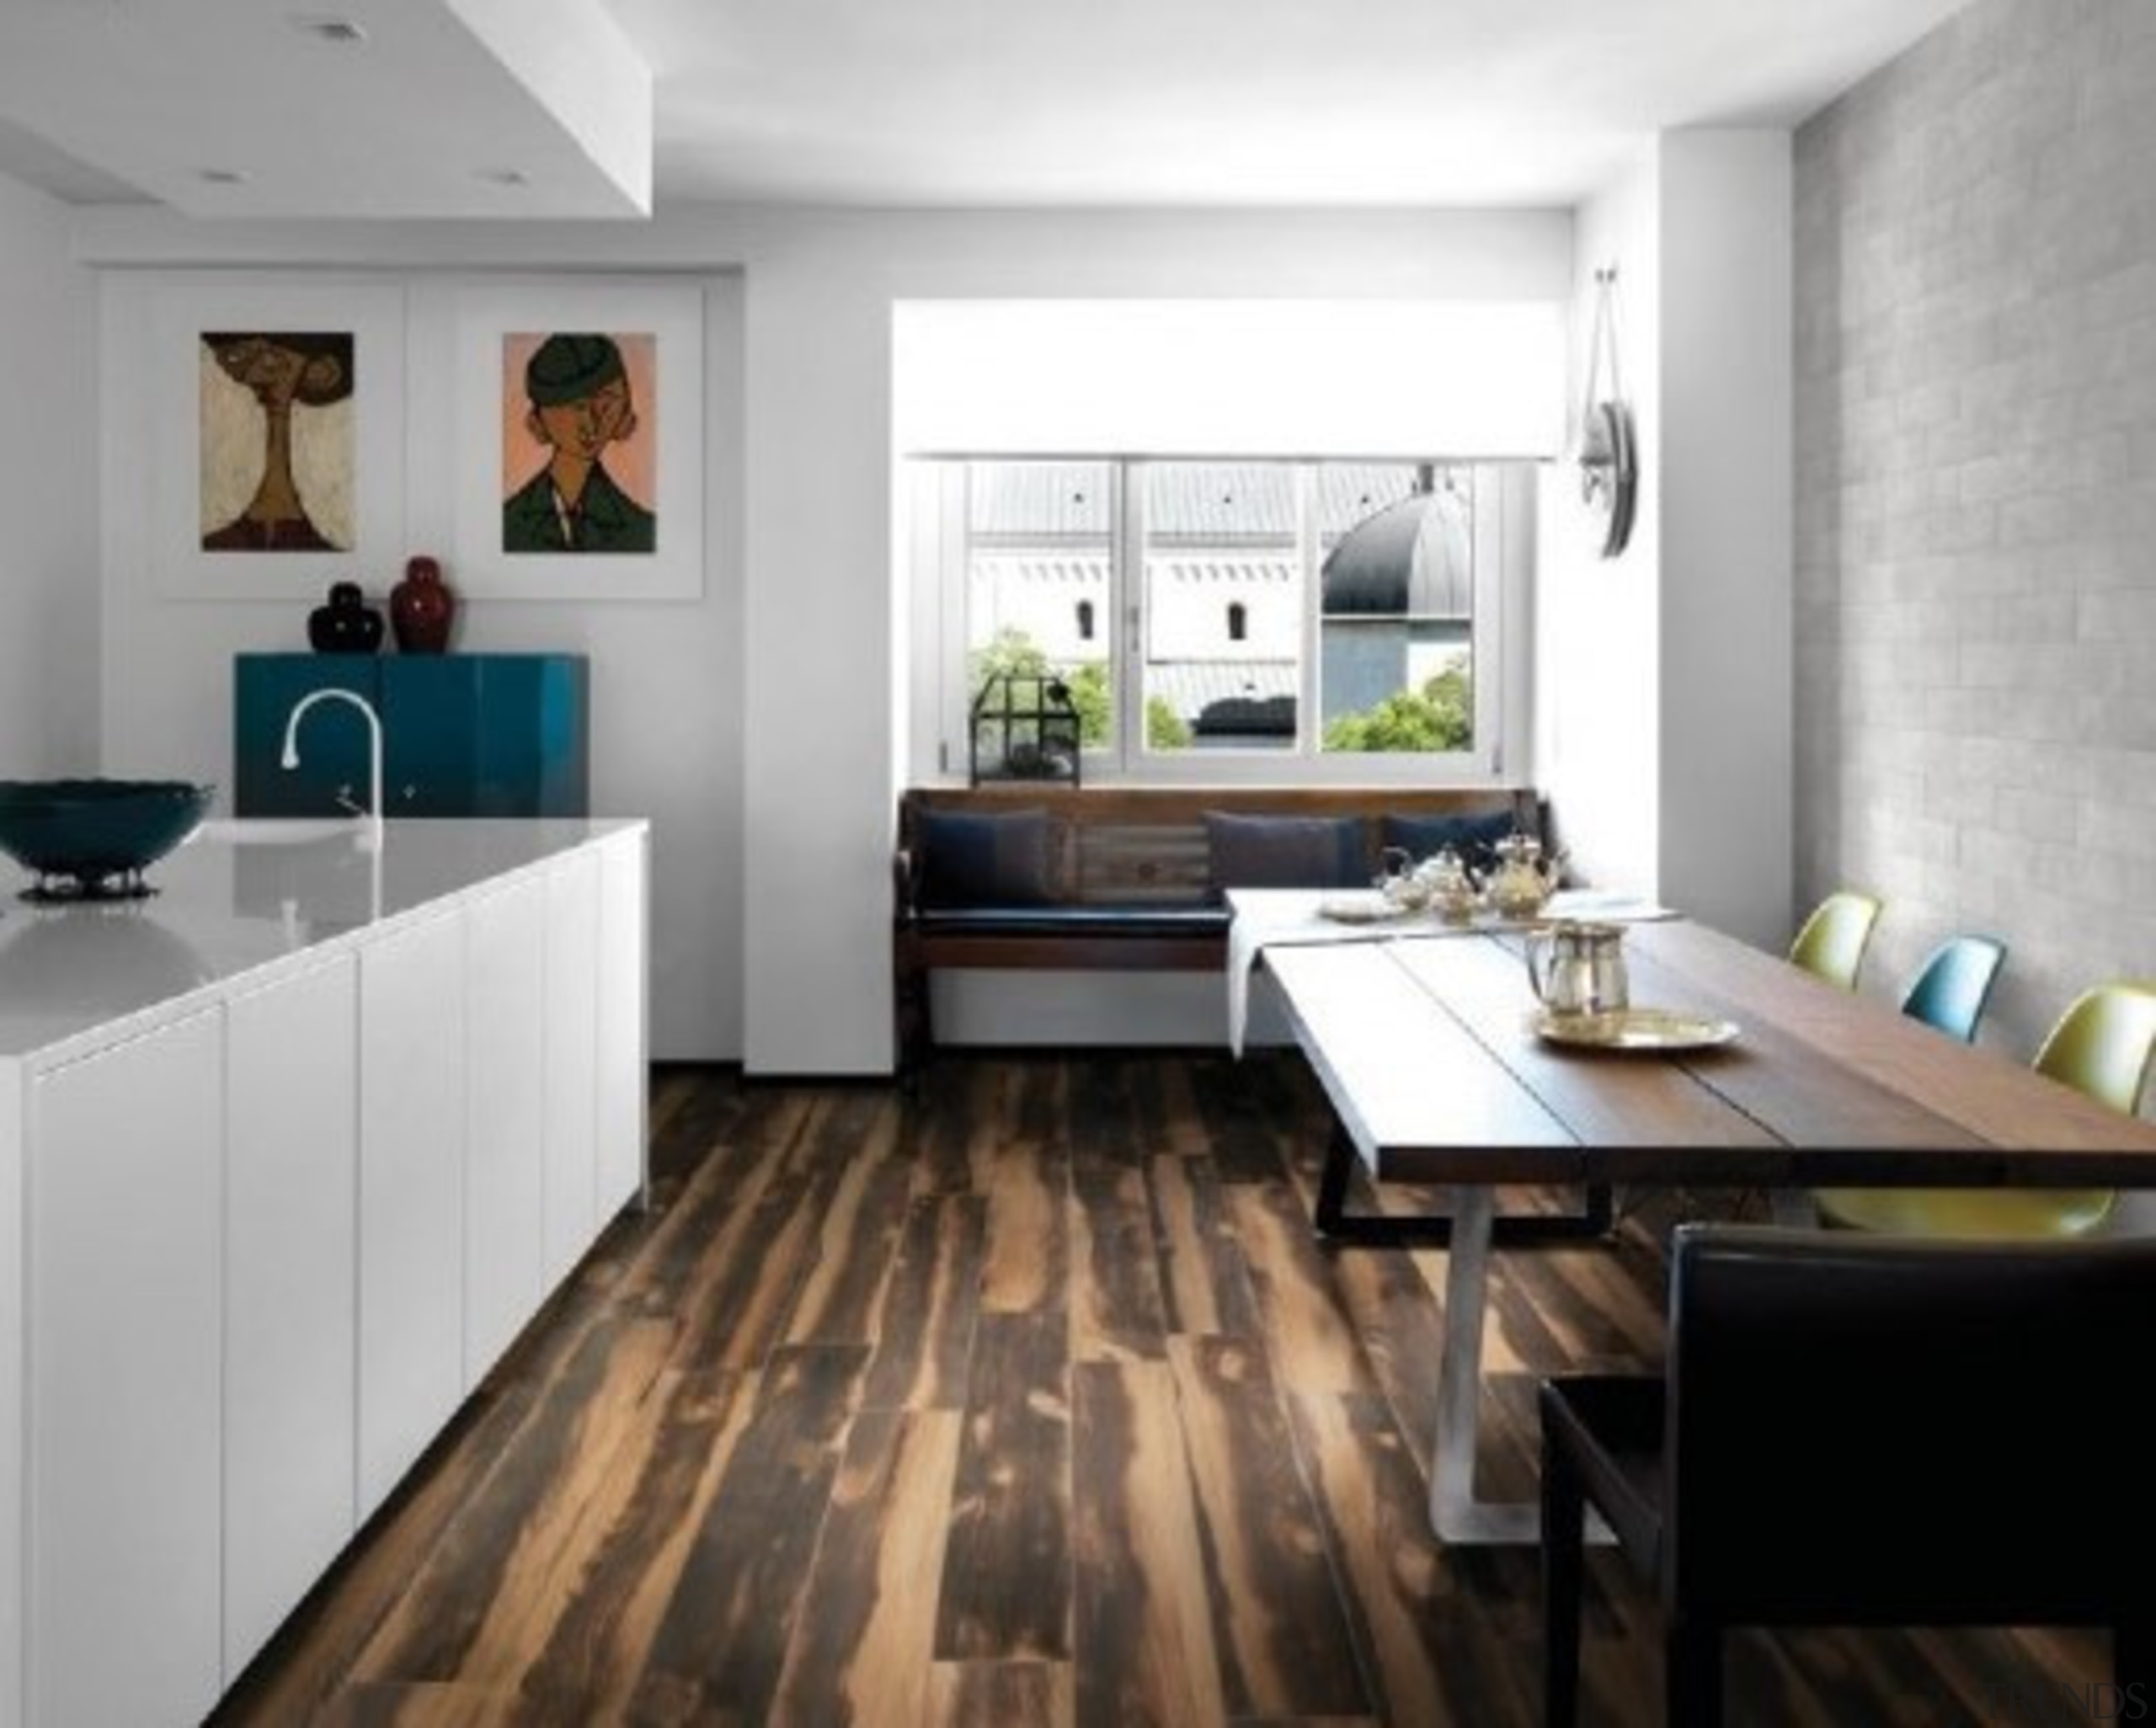 Burned Tanned 200x1200mm - Burned Tanned 200x1200mm - countertop, floor, flooring, interior design, kitchen, laminate flooring, room, wood flooring, white